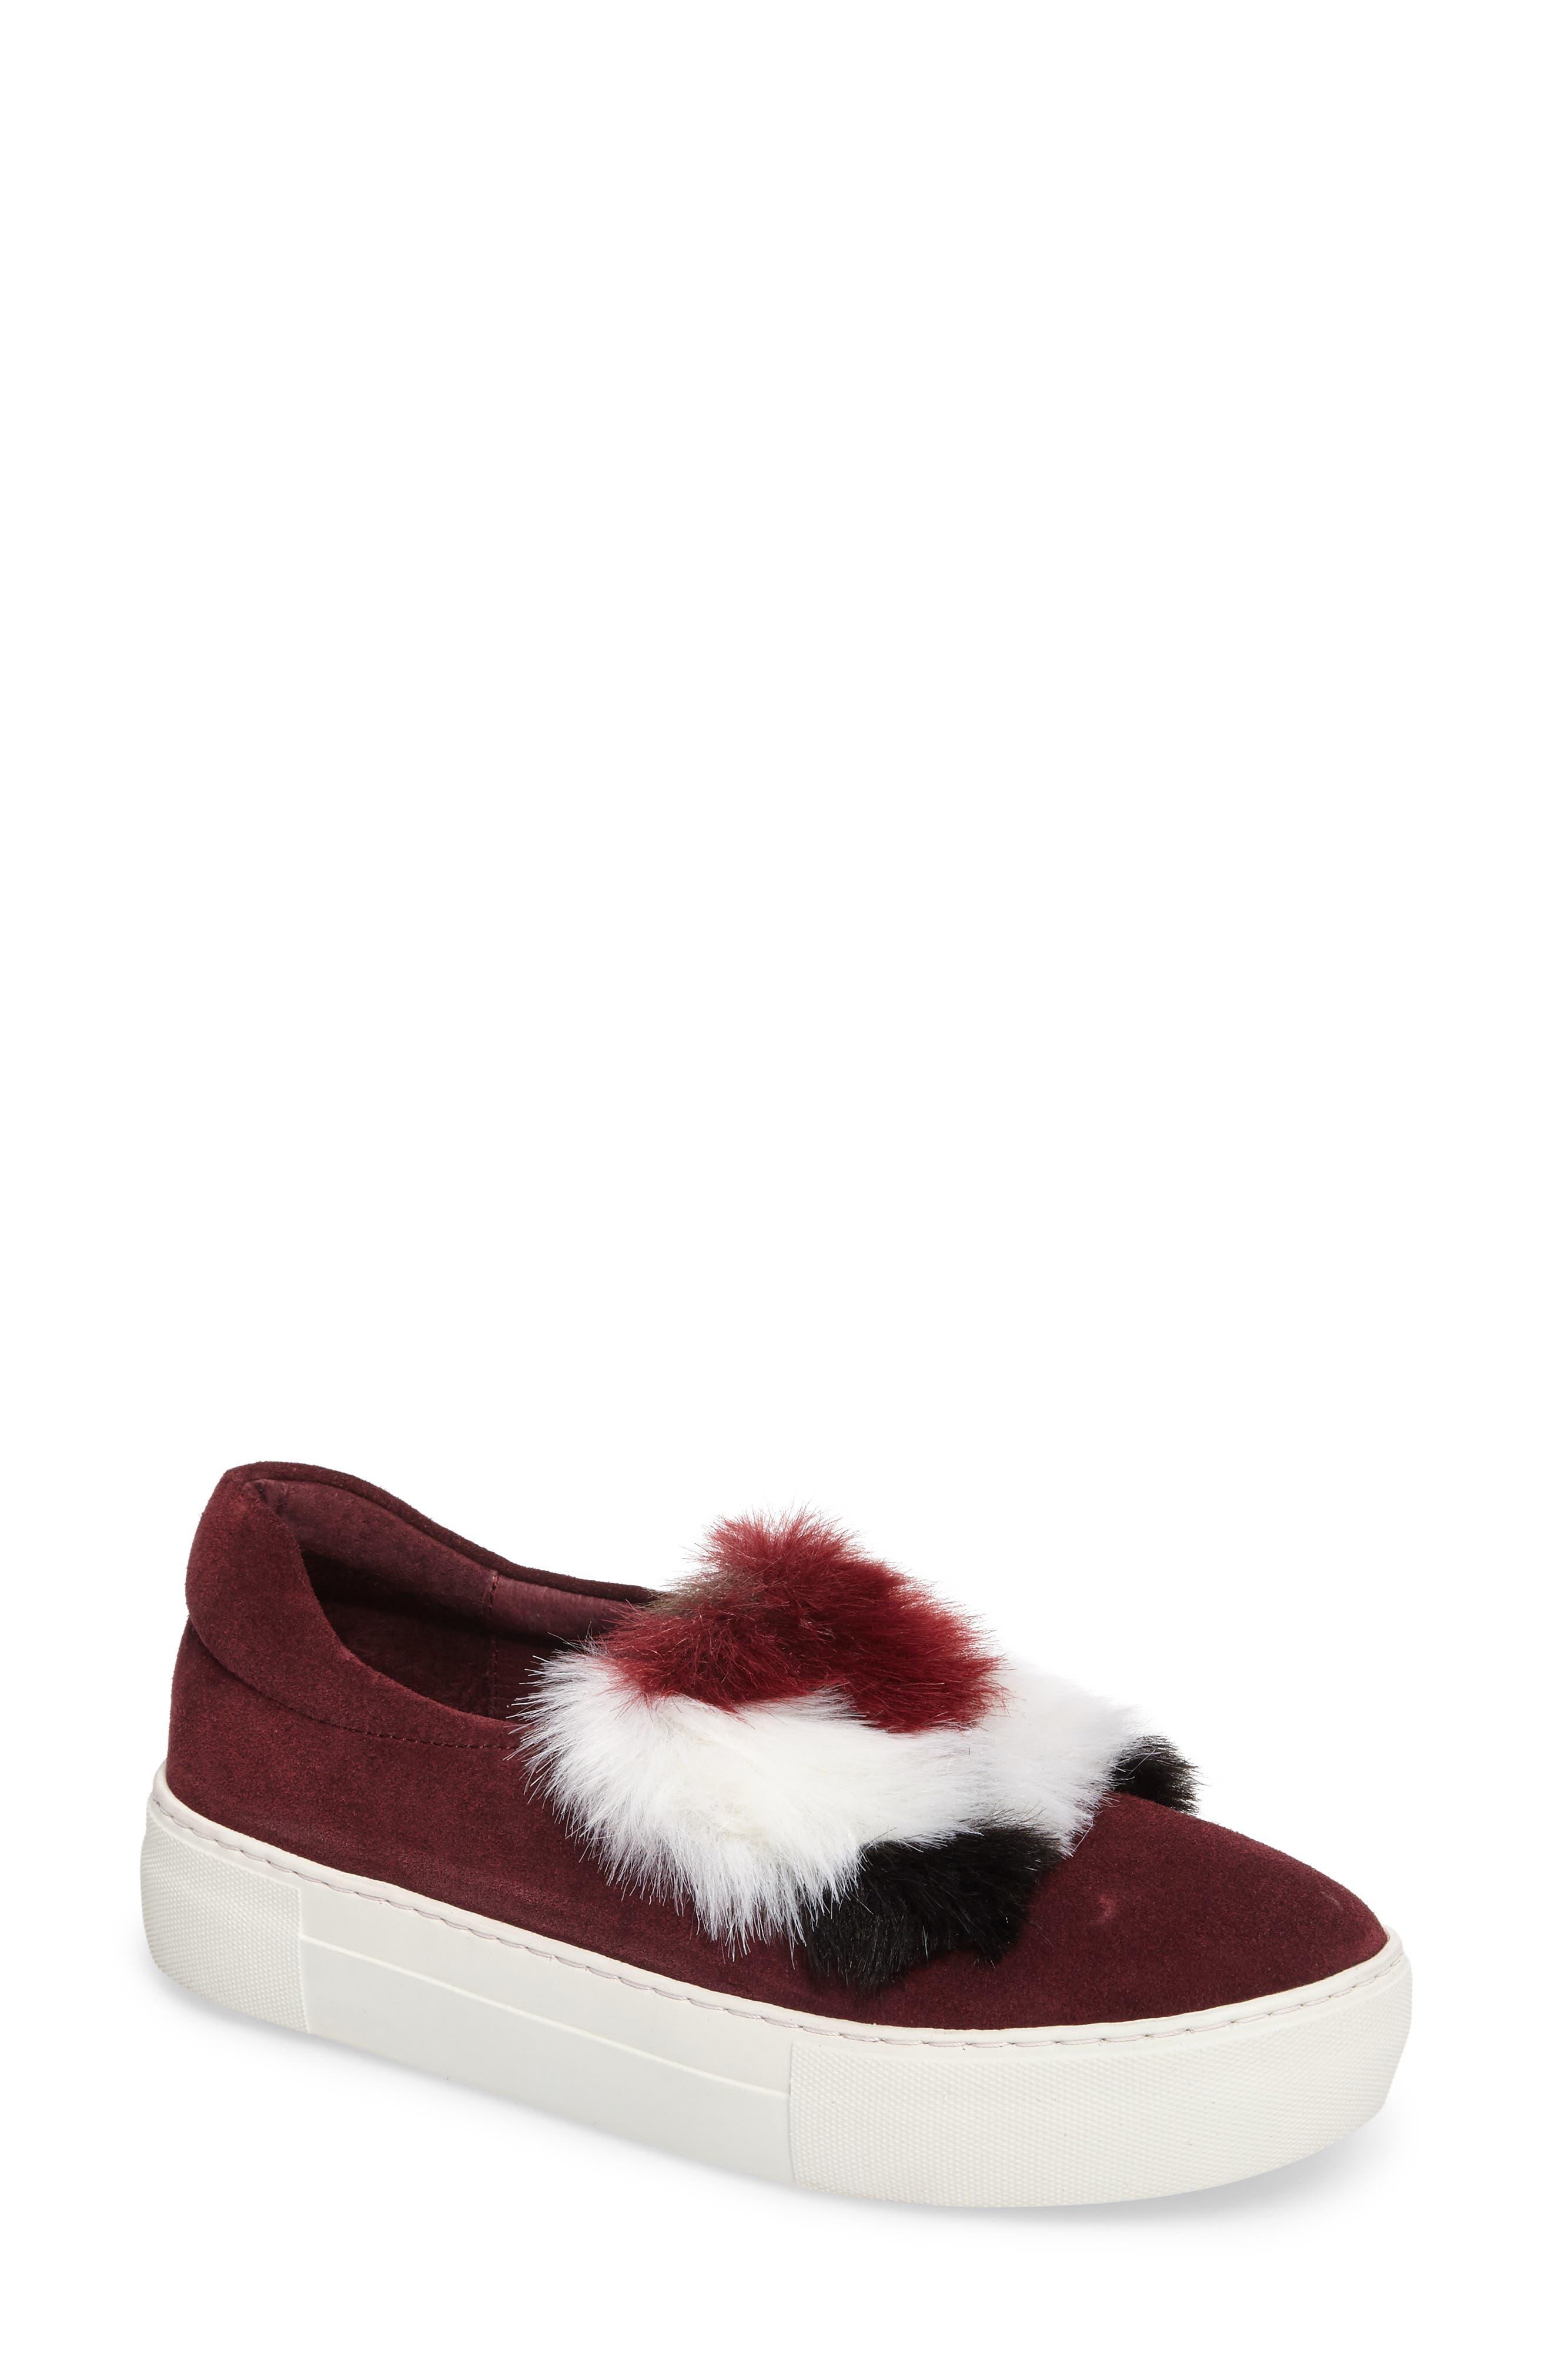 Alexi Faux Fur Slip-On Sneaker,                             Main thumbnail 1, color,                             Burgundy Suede